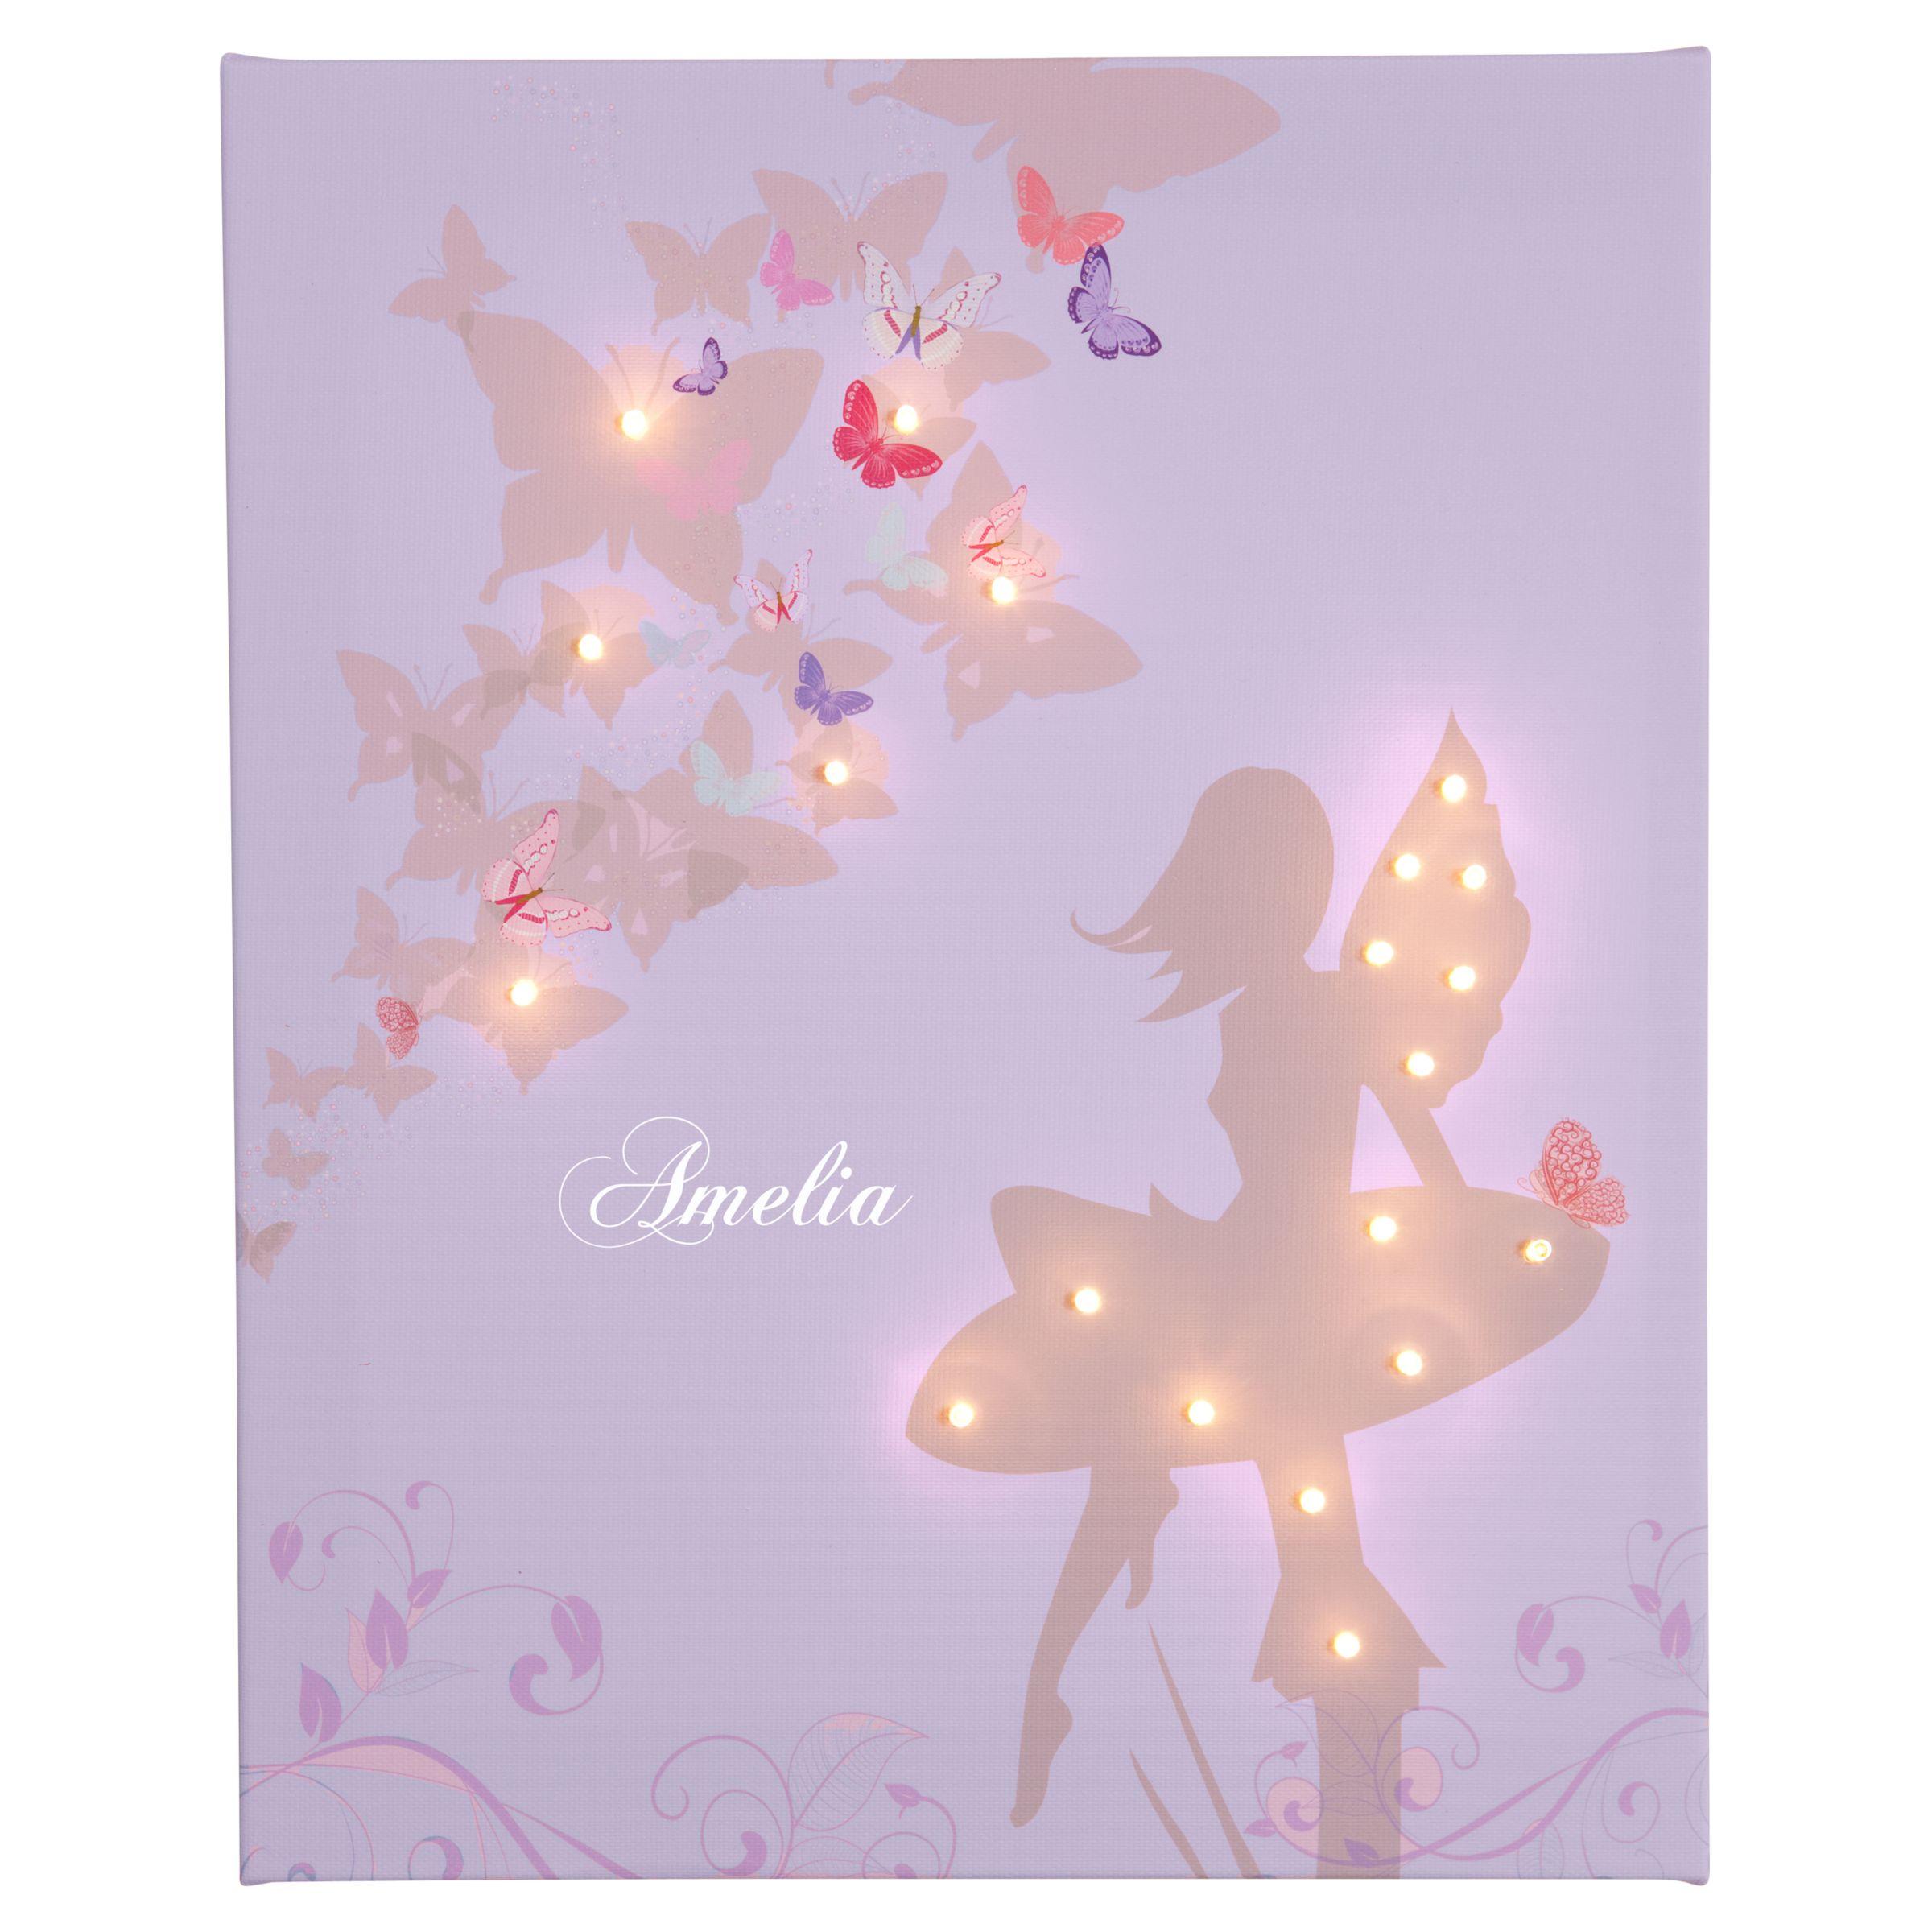 Illuminated Canvas Illuminated Canvas Personalised Fairy LED Canvas, 40 x 60cm